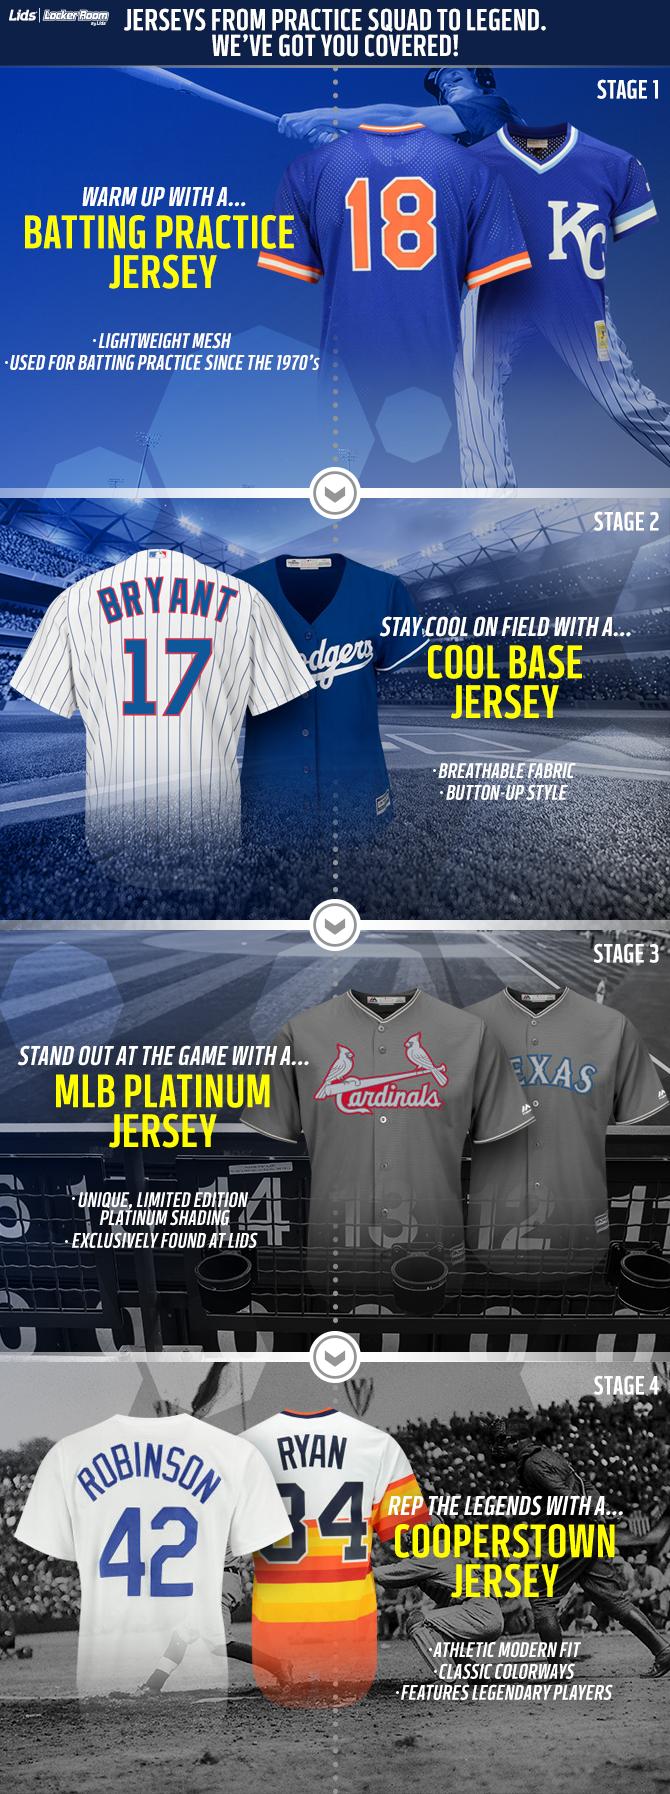 LIDS-MLBJerseys-Infographic